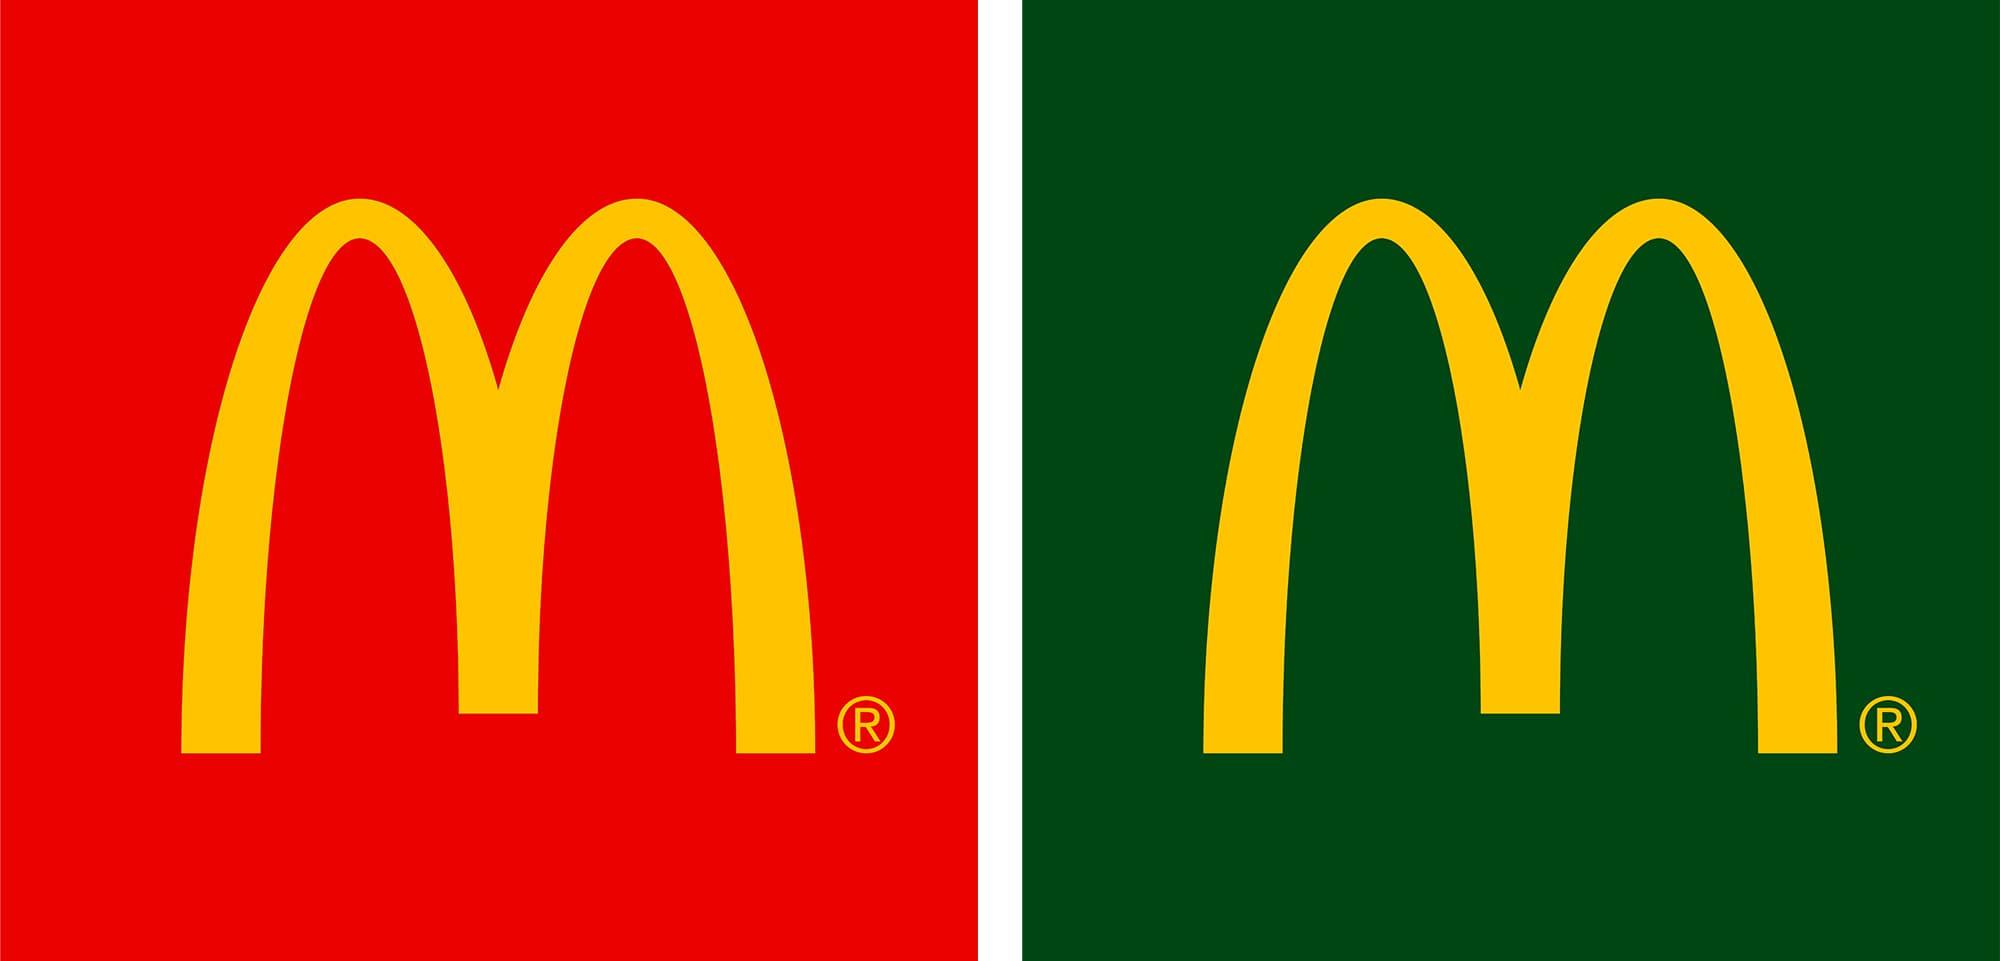 Rebranding: reinventarse o morir. McDonalds